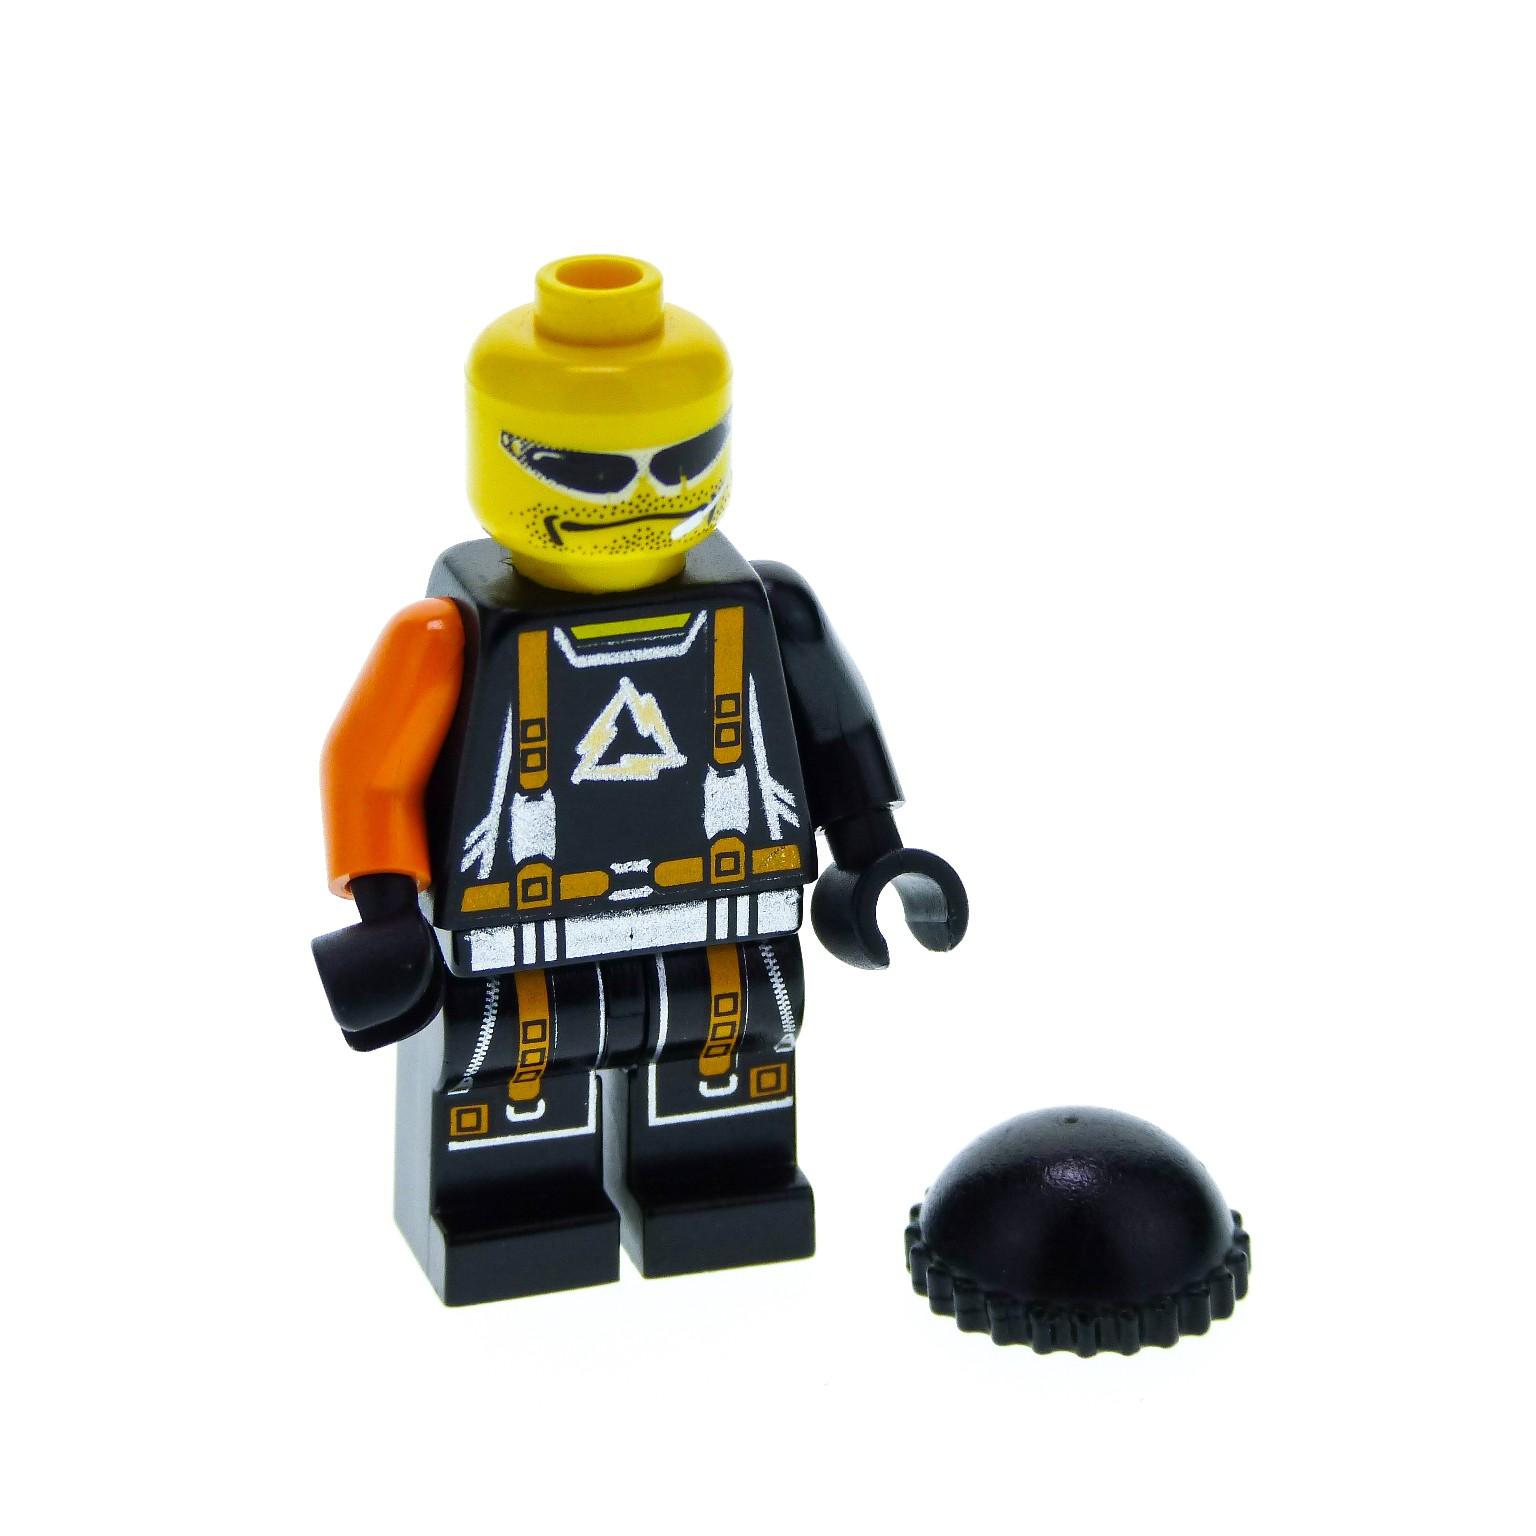 1 x lego system figur alpha team mission deep freeze flex arctic torso schwarz gurt orange. Black Bedroom Furniture Sets. Home Design Ideas